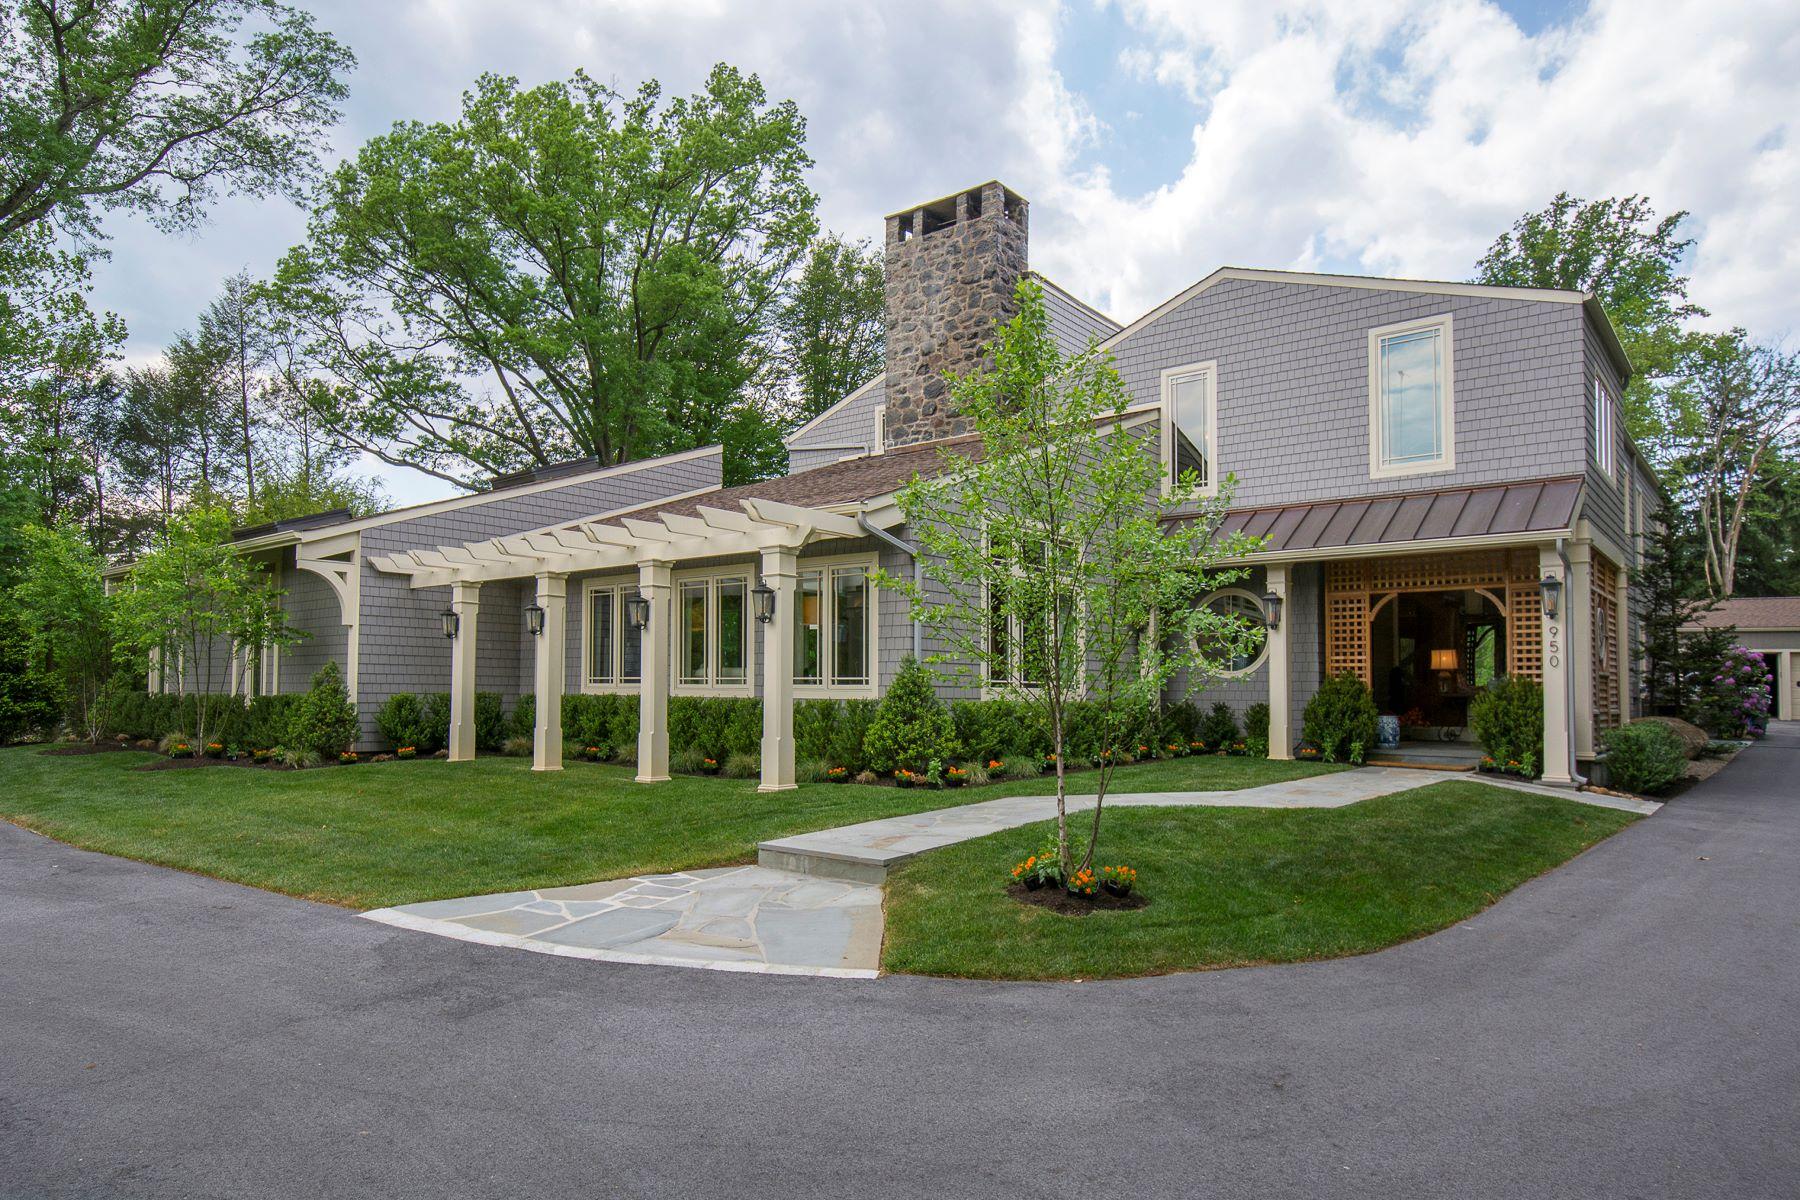 Single Family Homes for Sale at 950 PARKES RUN LN Villanova, Pennsylvania 19085 United States